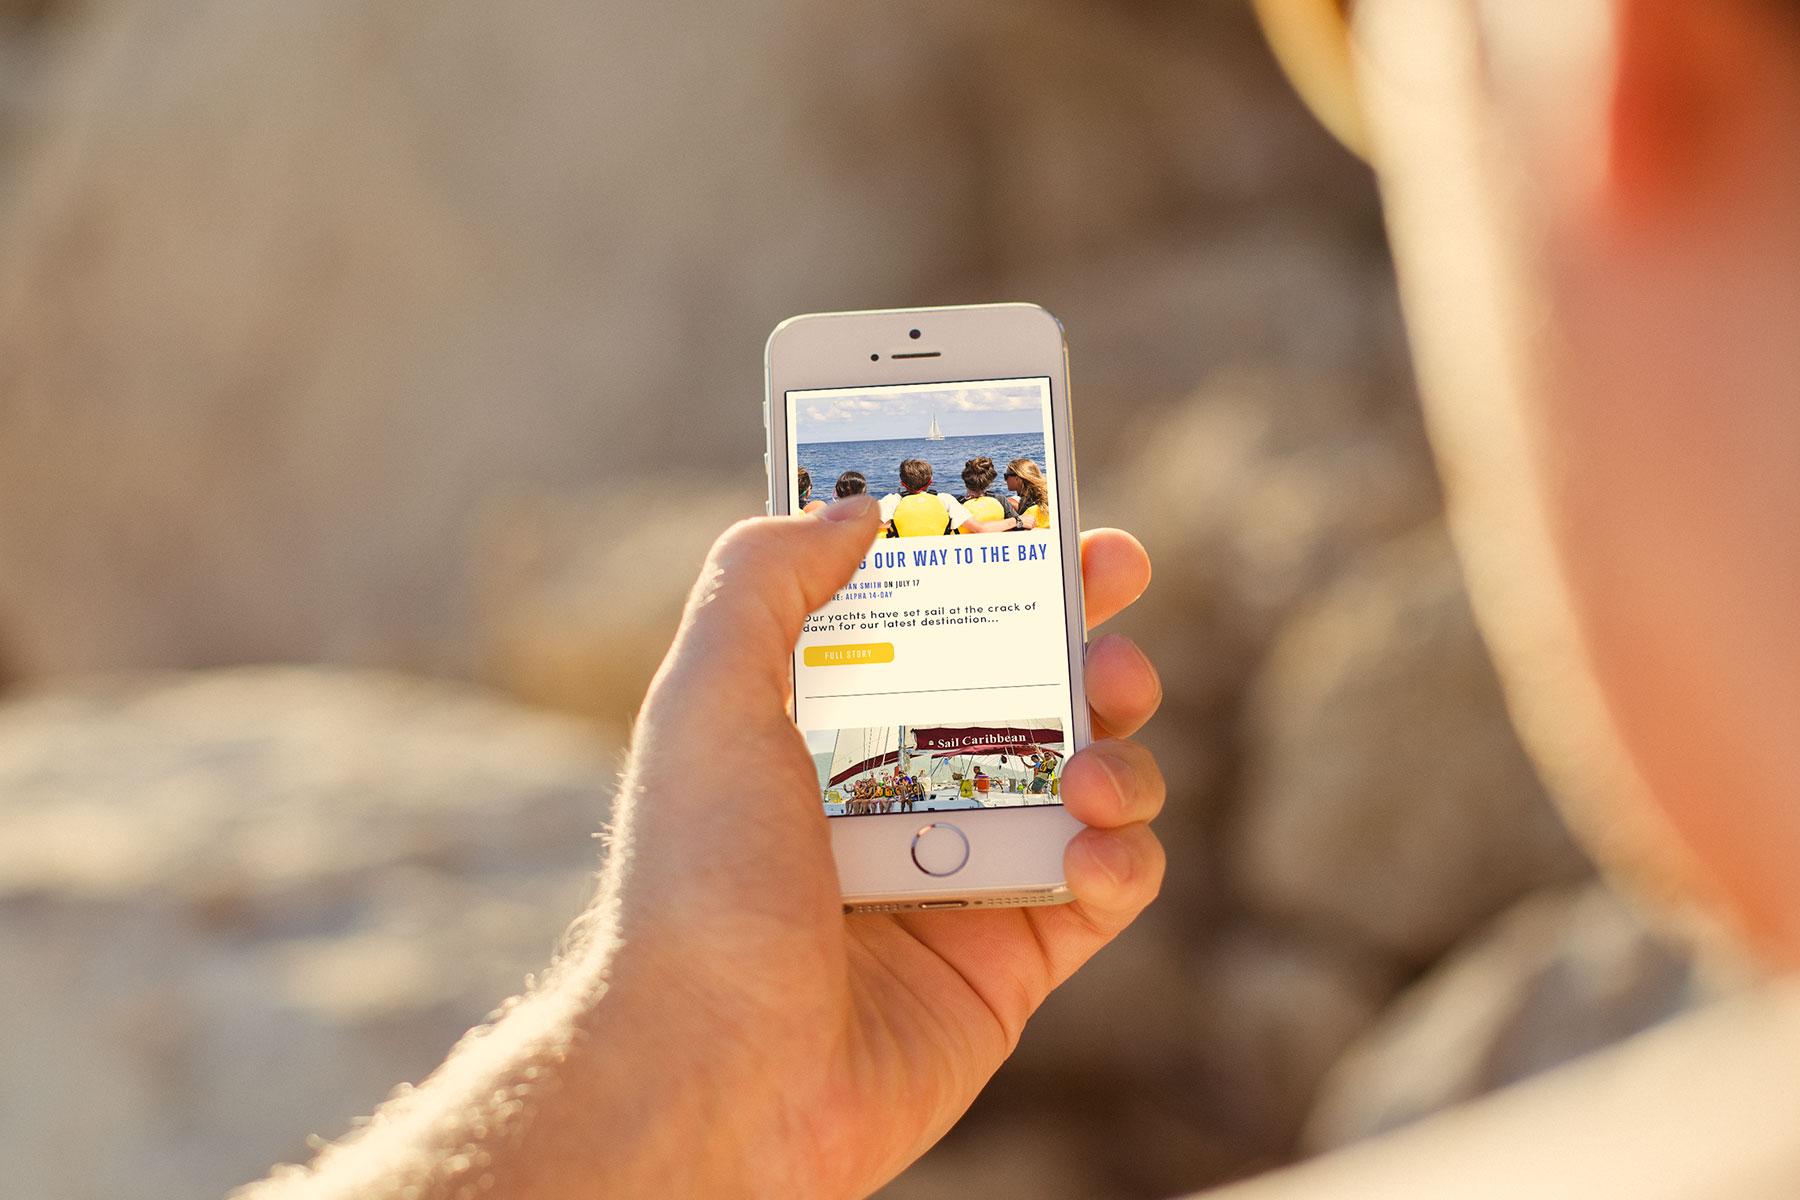 sail-caribbean-blog-mobile-alternate